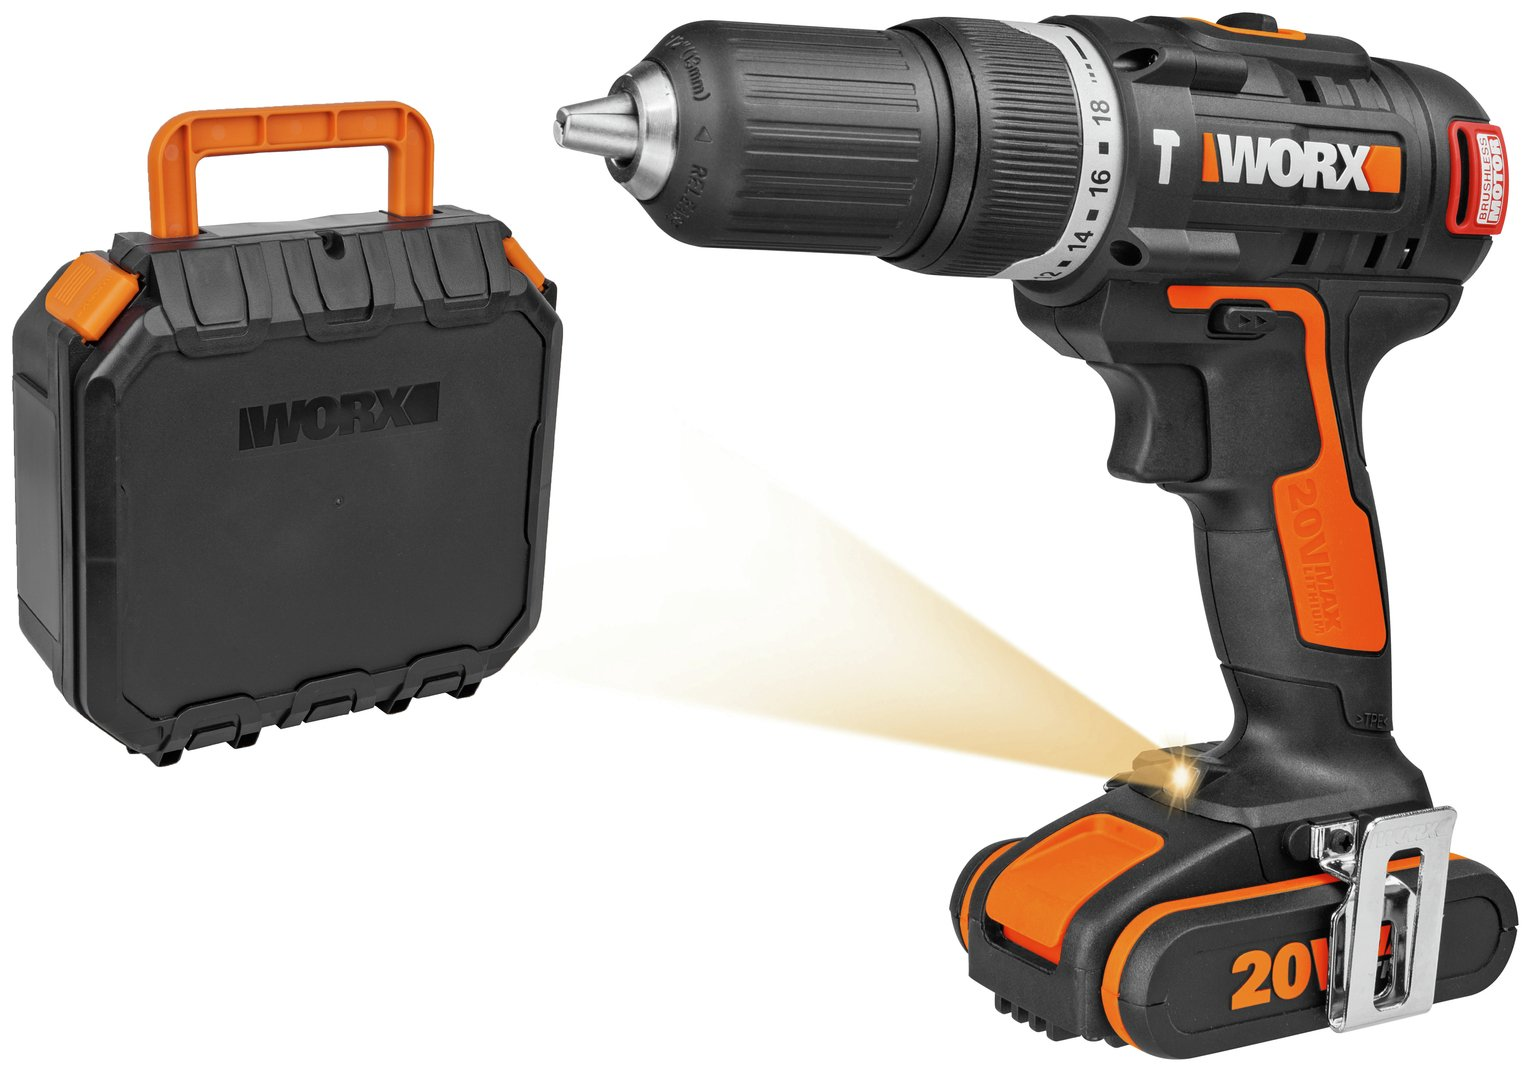 6924328307082 Ean Worx Wg629 E 1 Hydroshot 20 V Portable